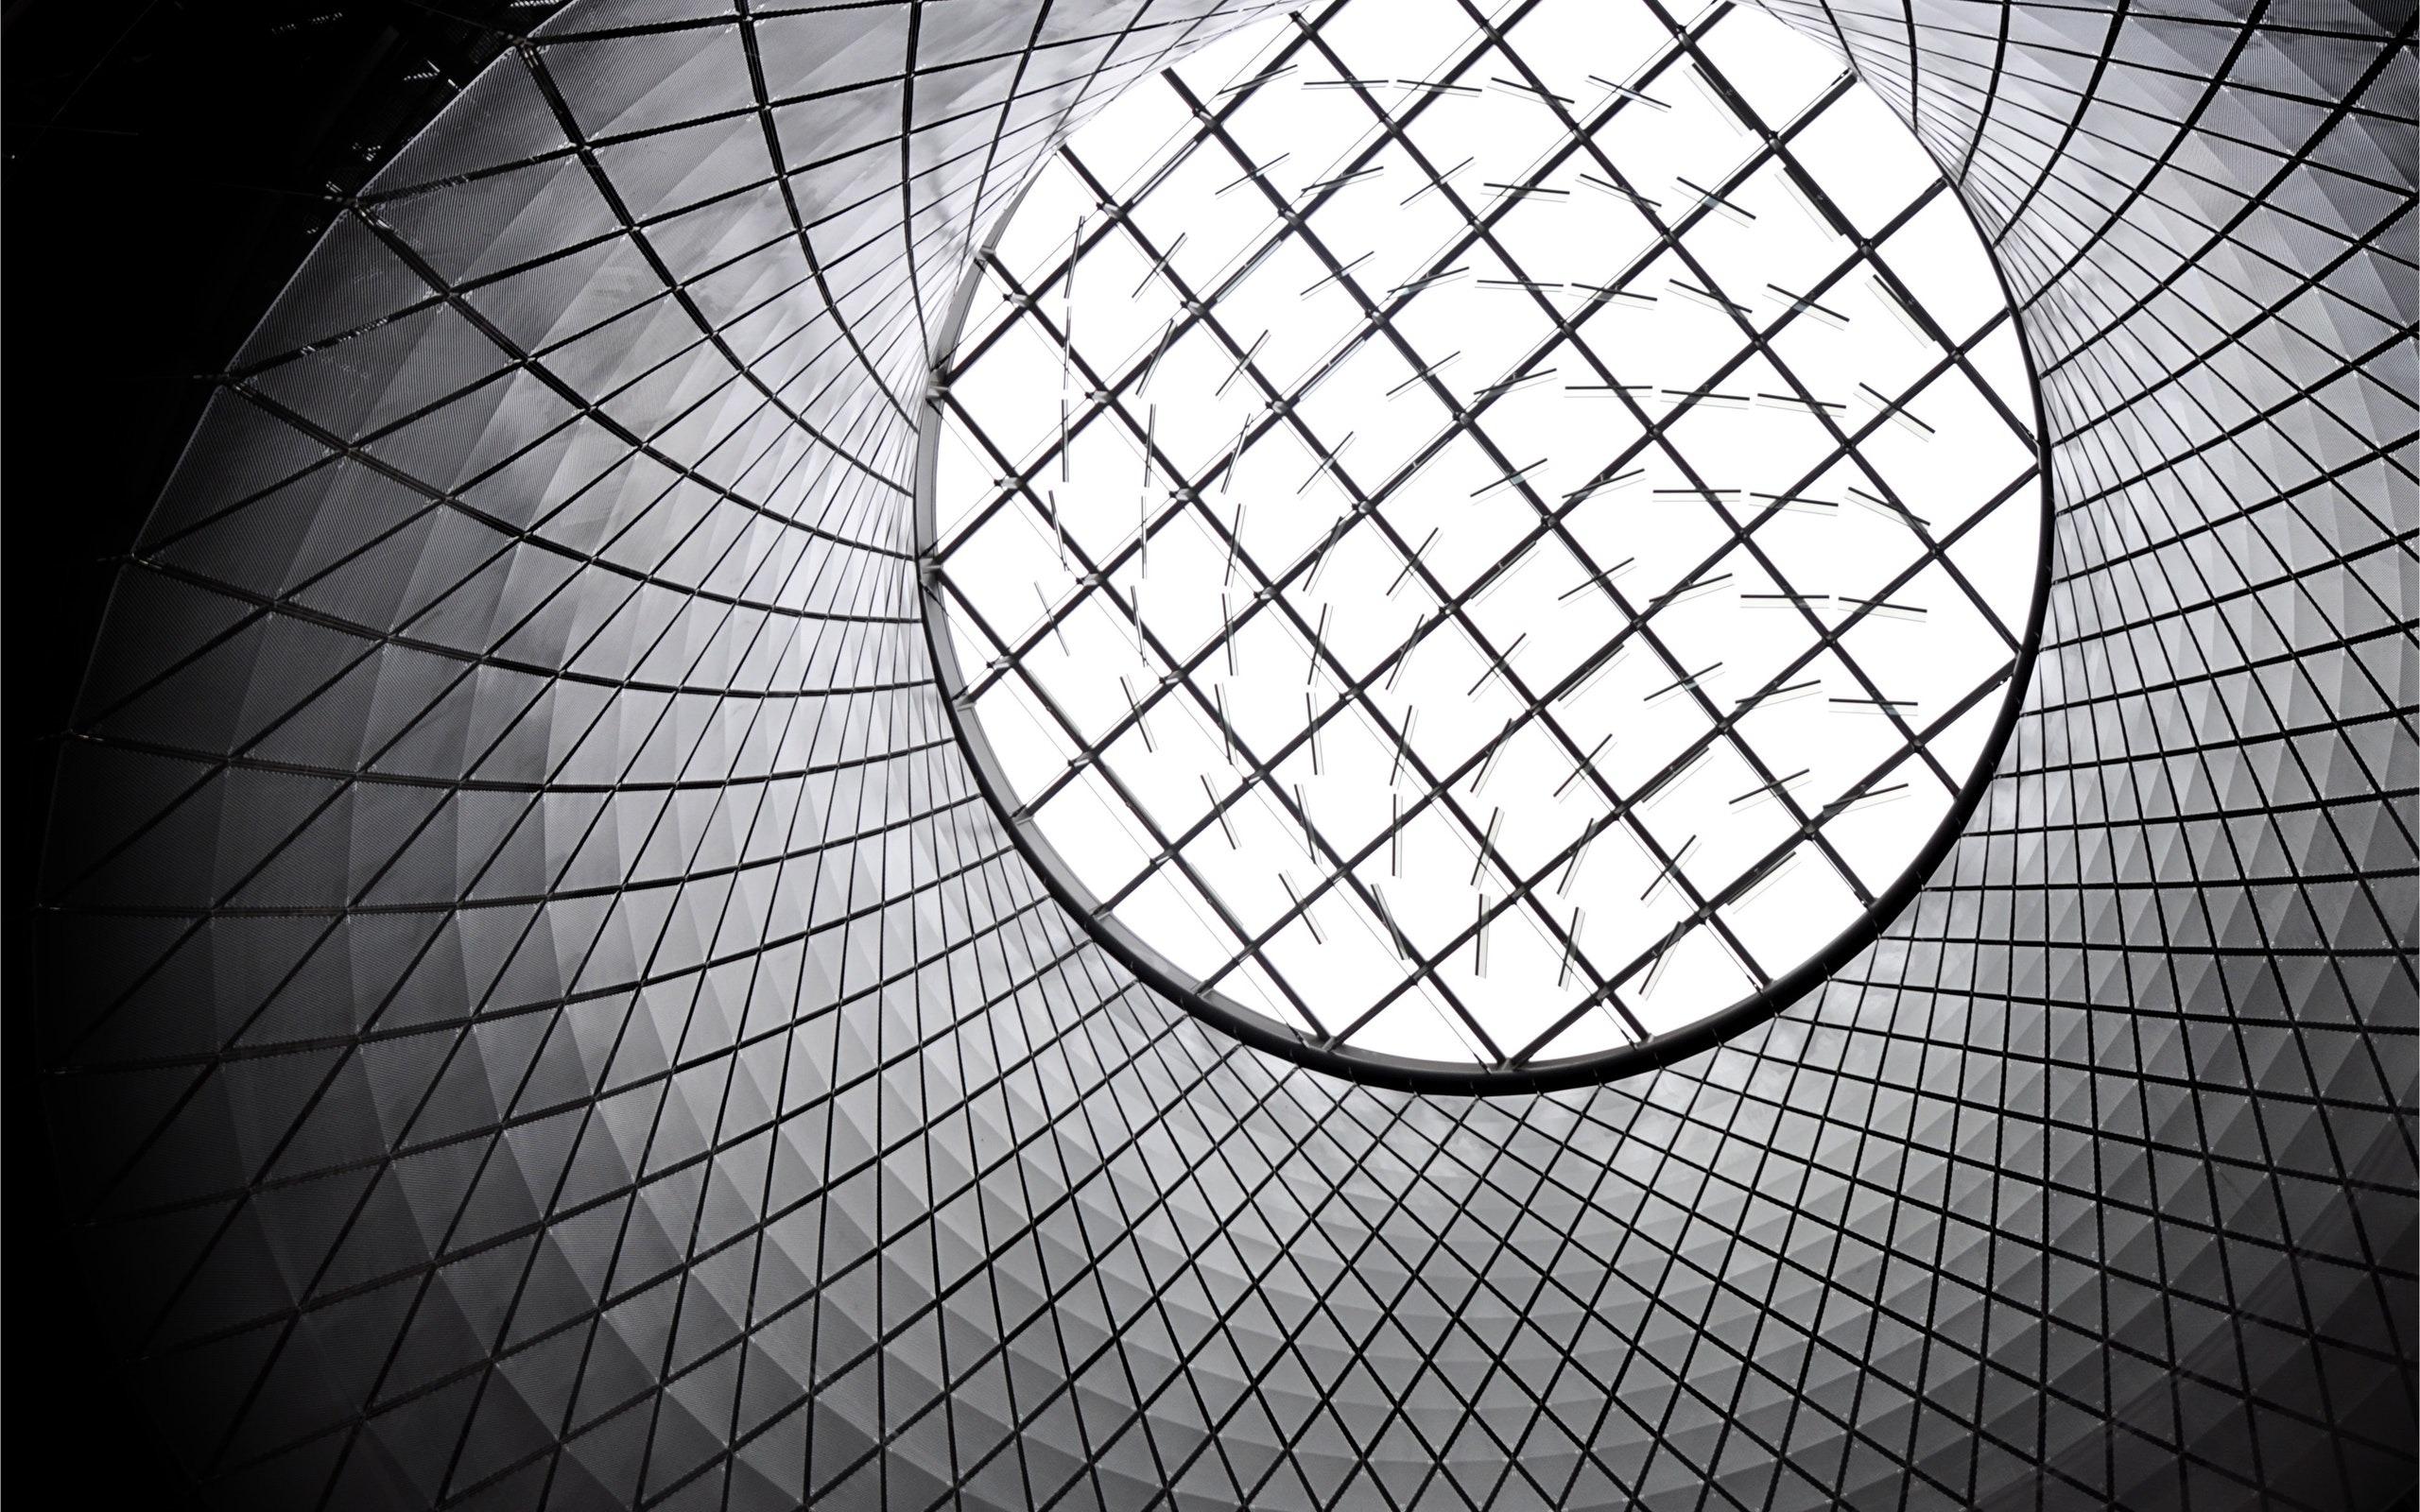 Resolução Original - - Architecture Building Pictures Black And White , HD Wallpaper & Backgrounds